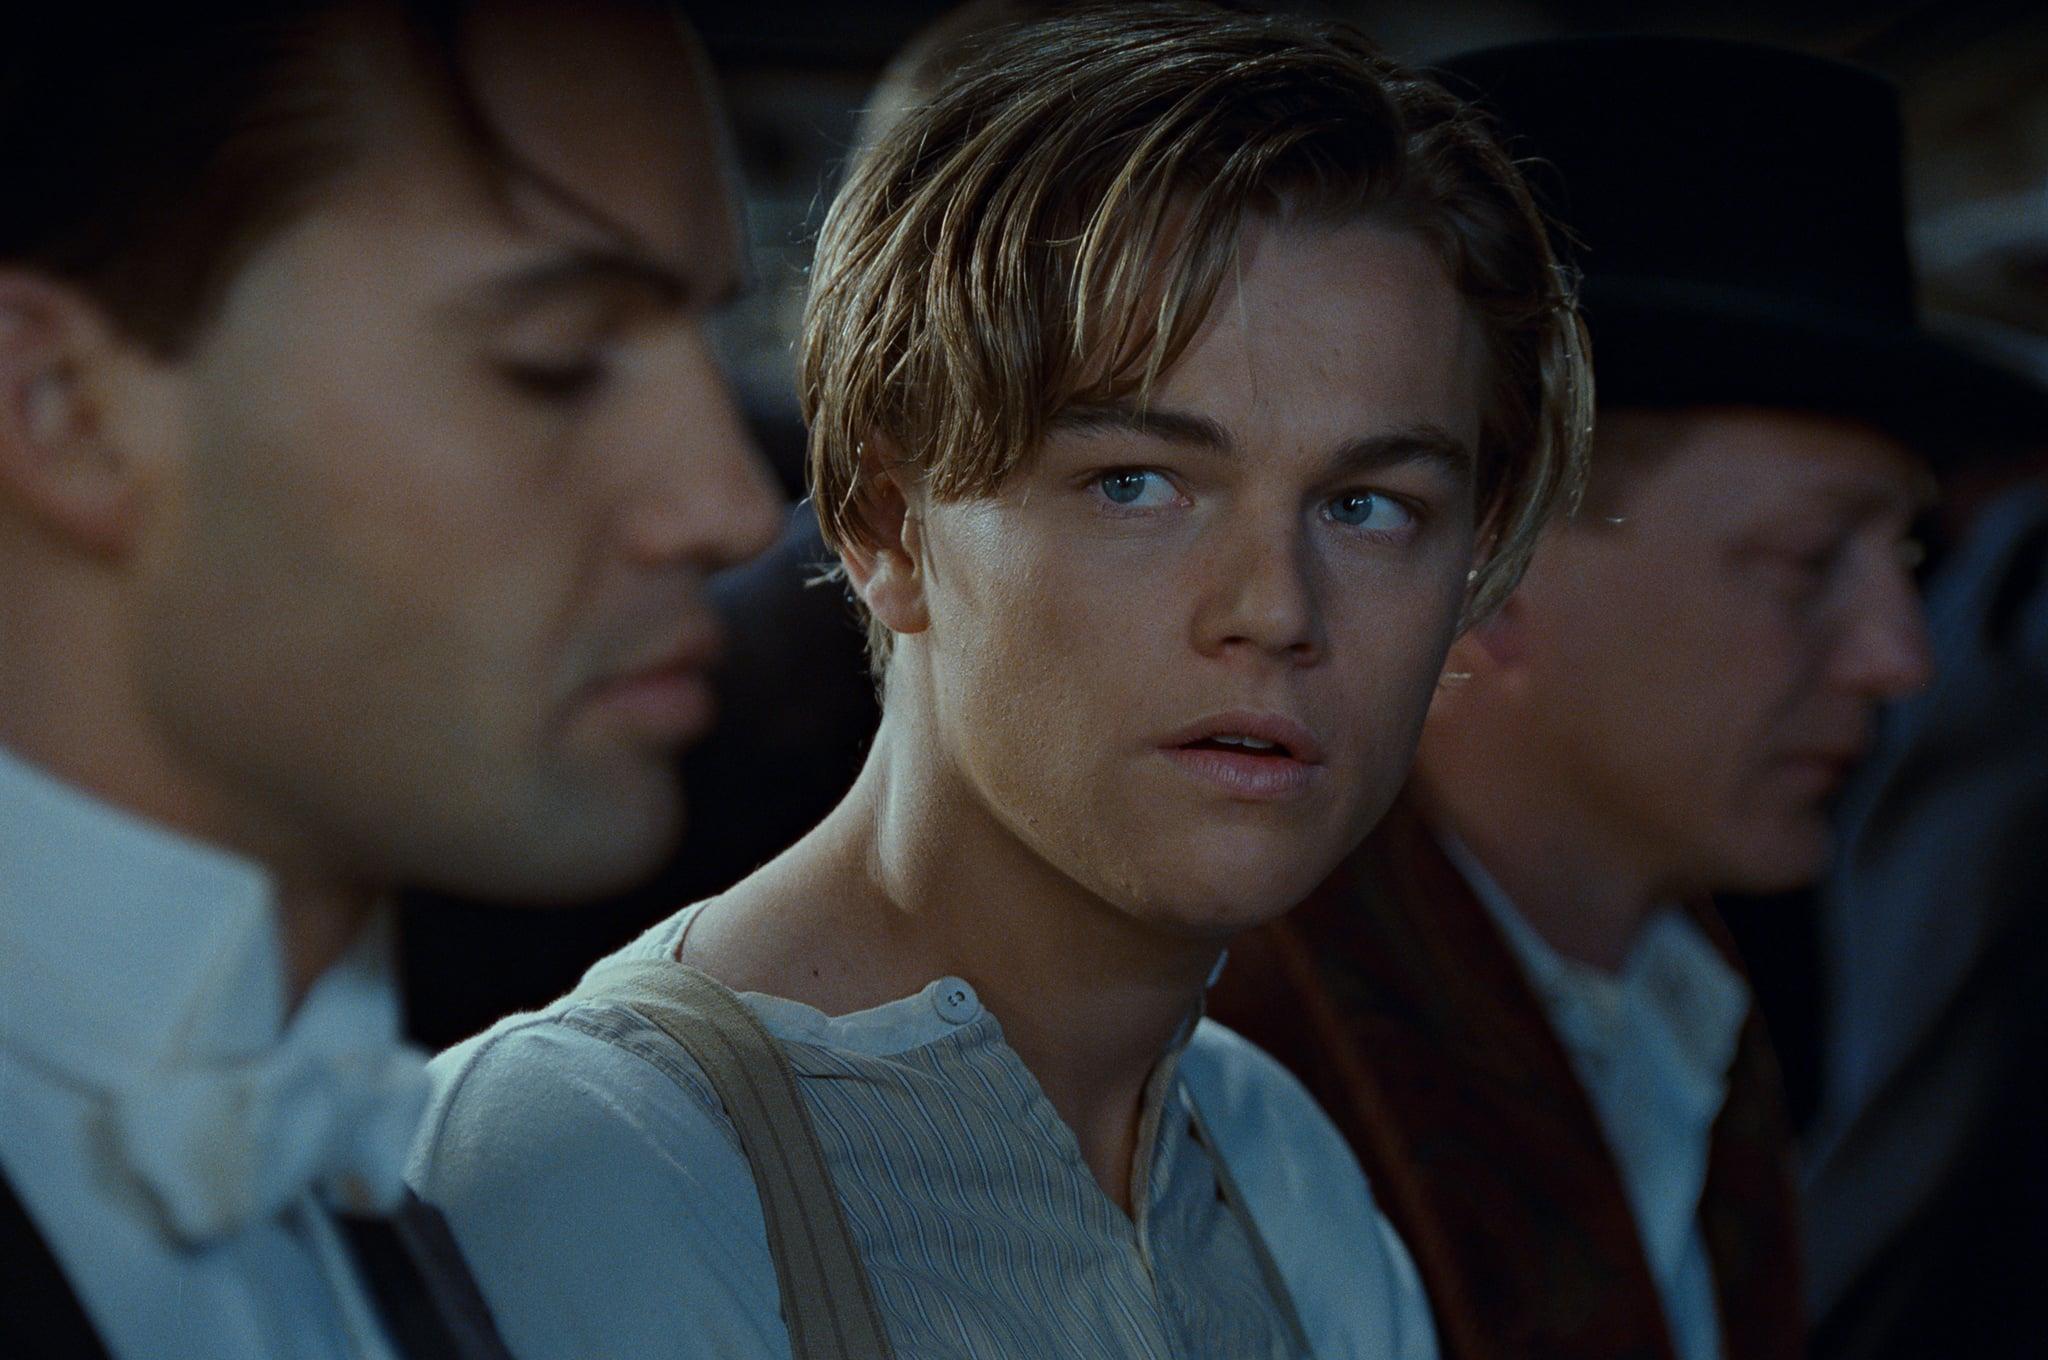 Billy Zane and Leonardo DiCaprio in Titanic.